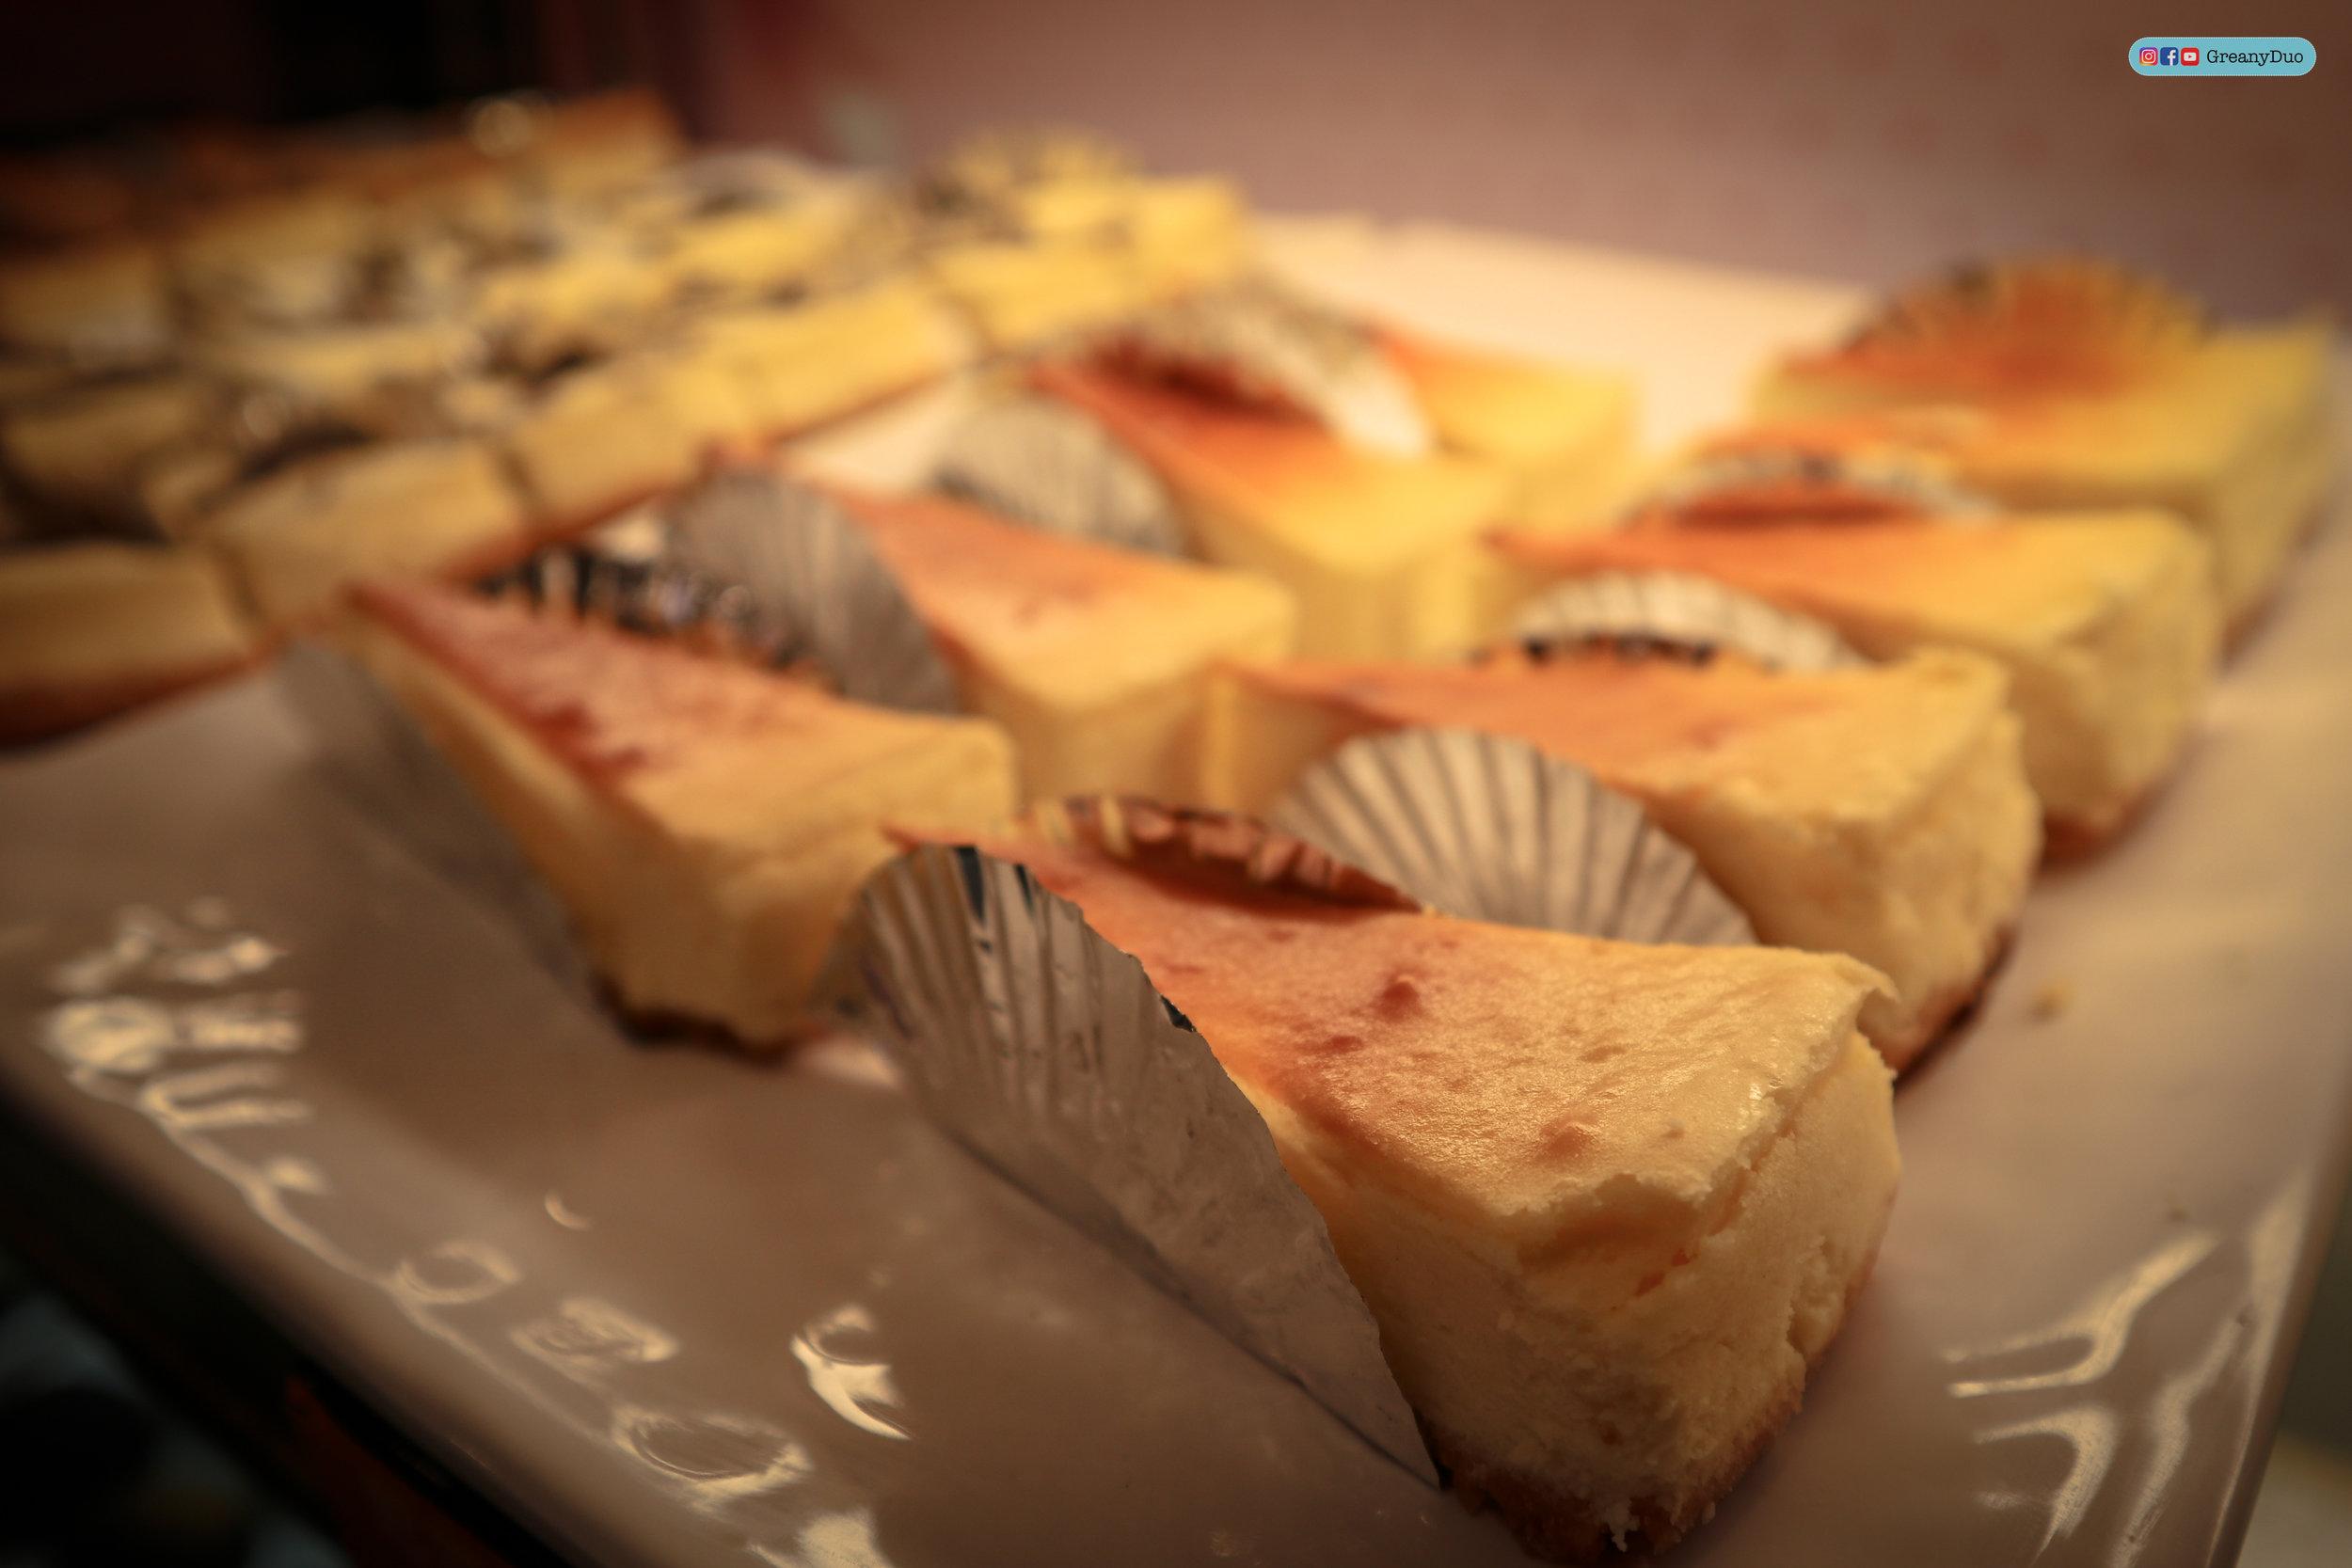 cheesecake at บุฟเฟ่ต์ชาบูไต้หวันที่ Hakkai Shabu Shabu ซีเหมินติง